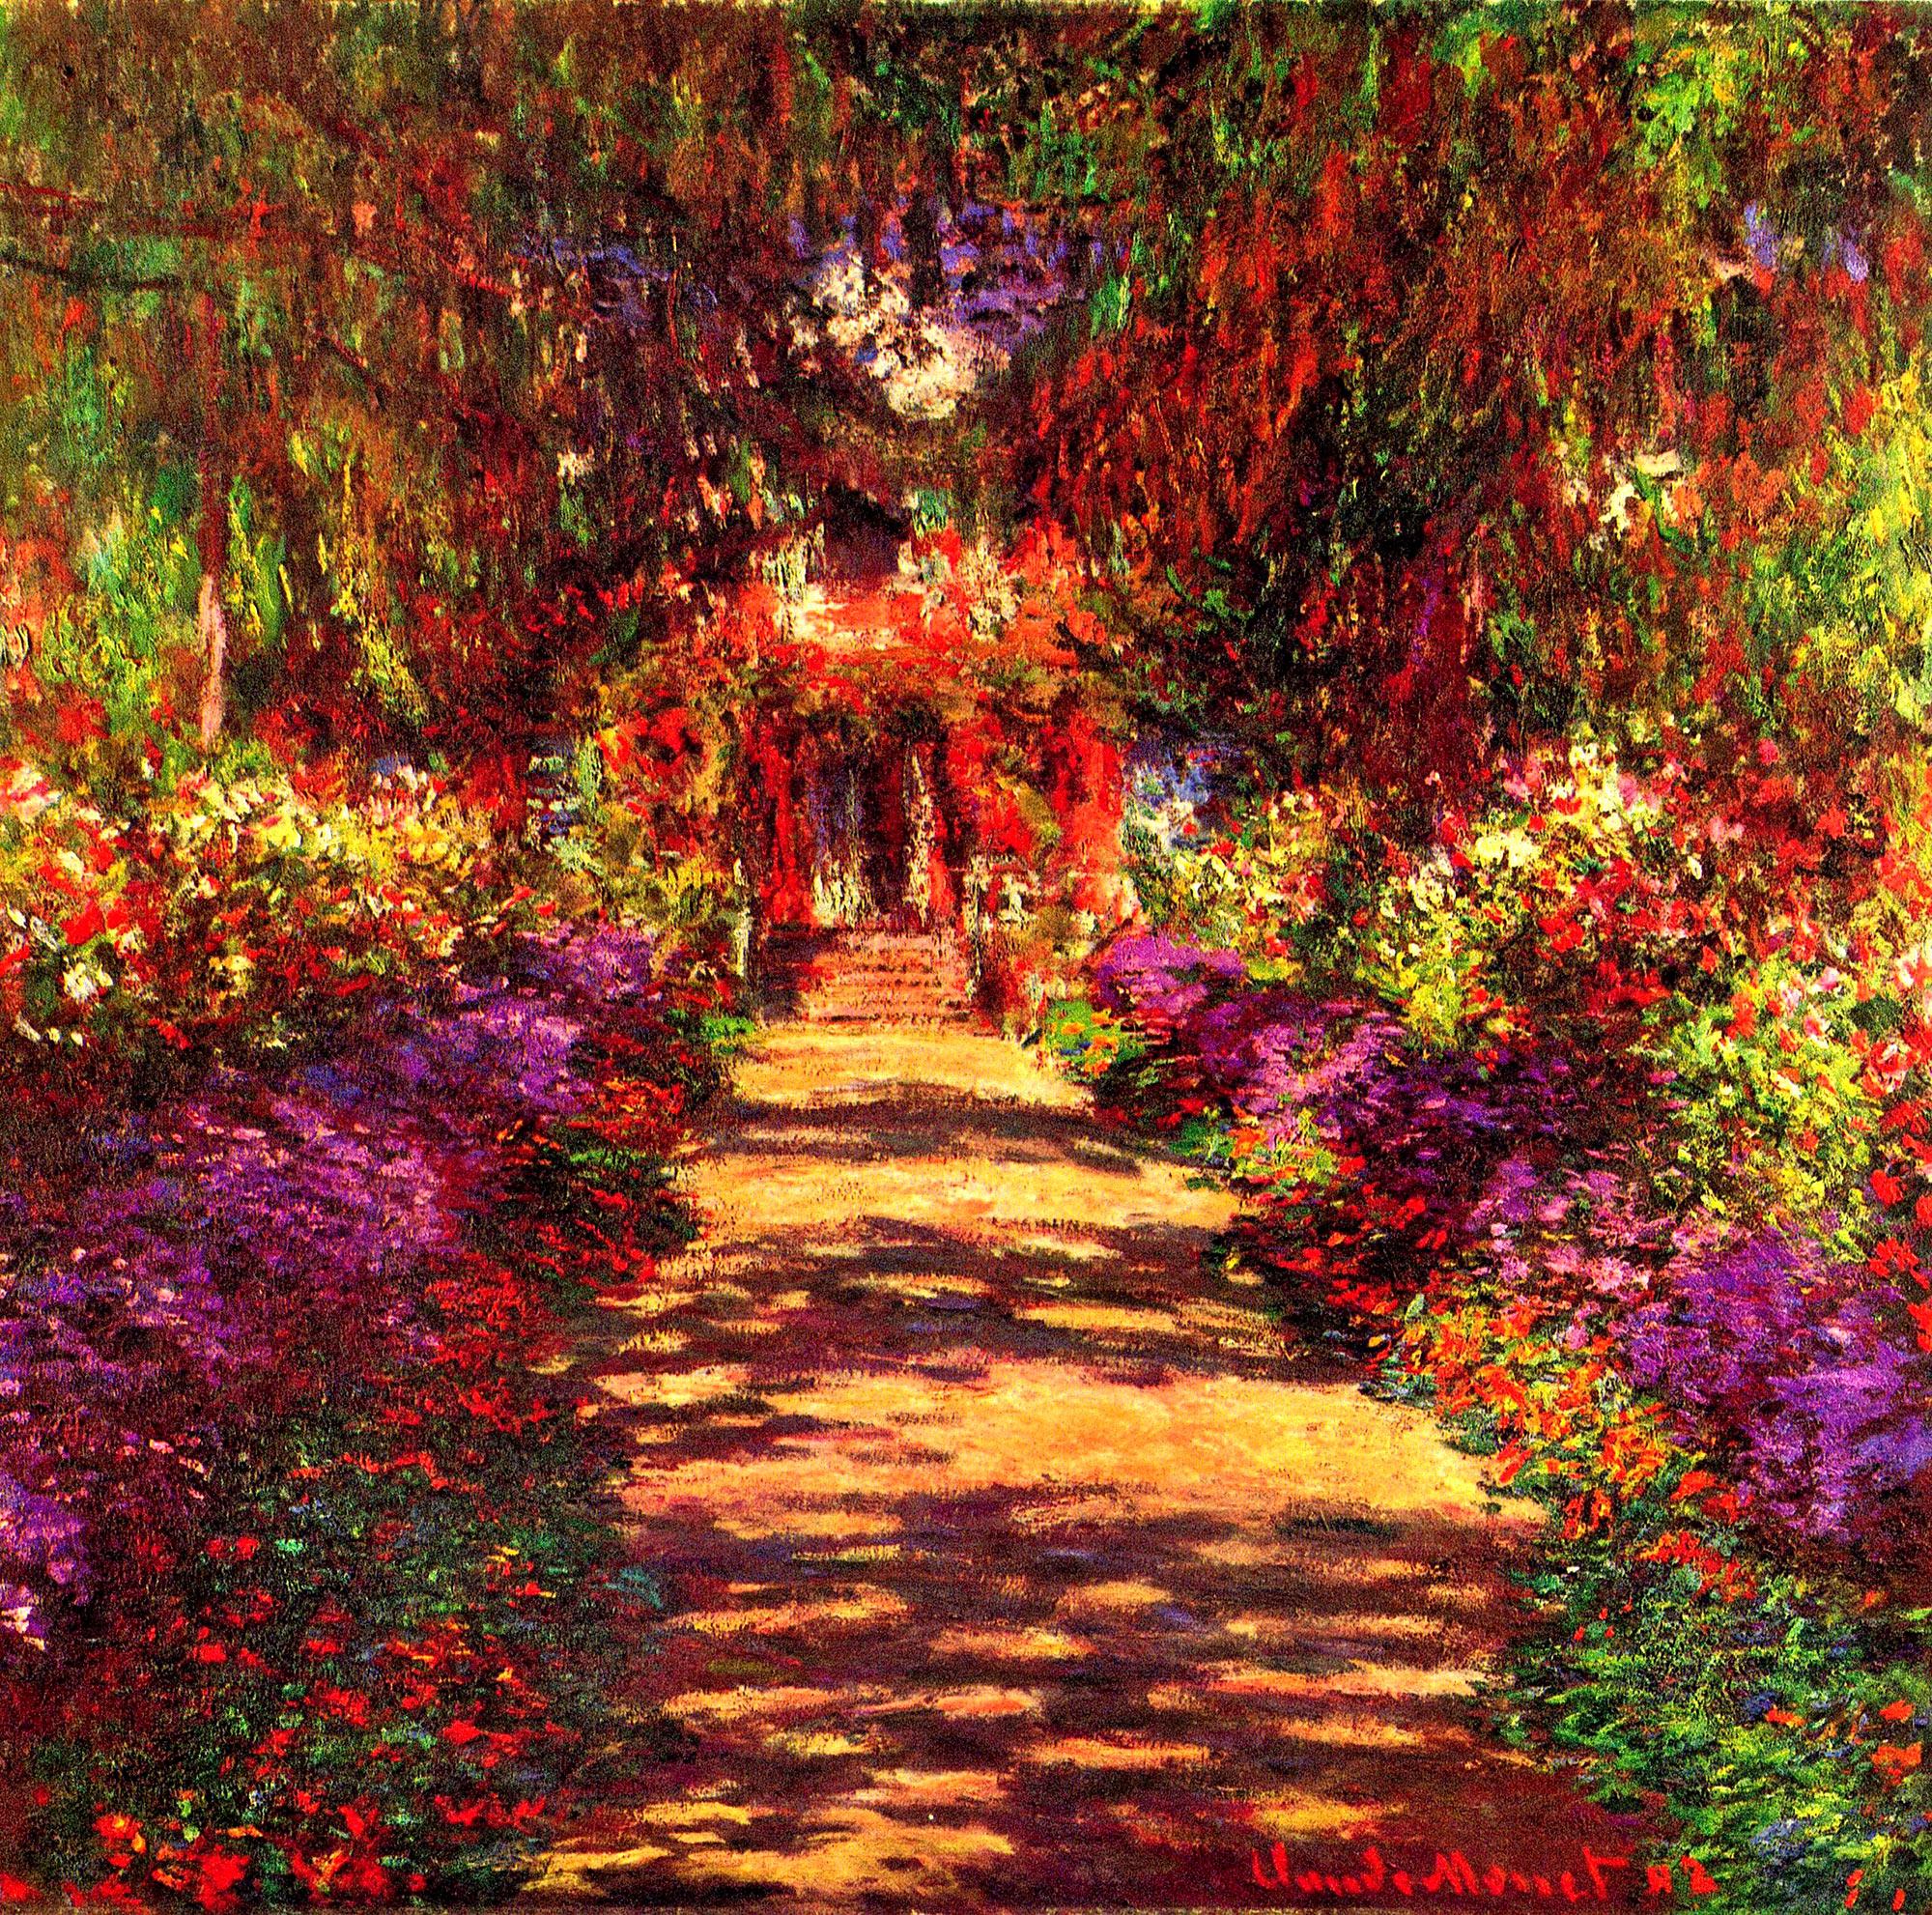 пейзаж < Тропа в саду Моне, Живерни >:: Клод Моне, описание картины - Моне Клод (Claude Monet) фото